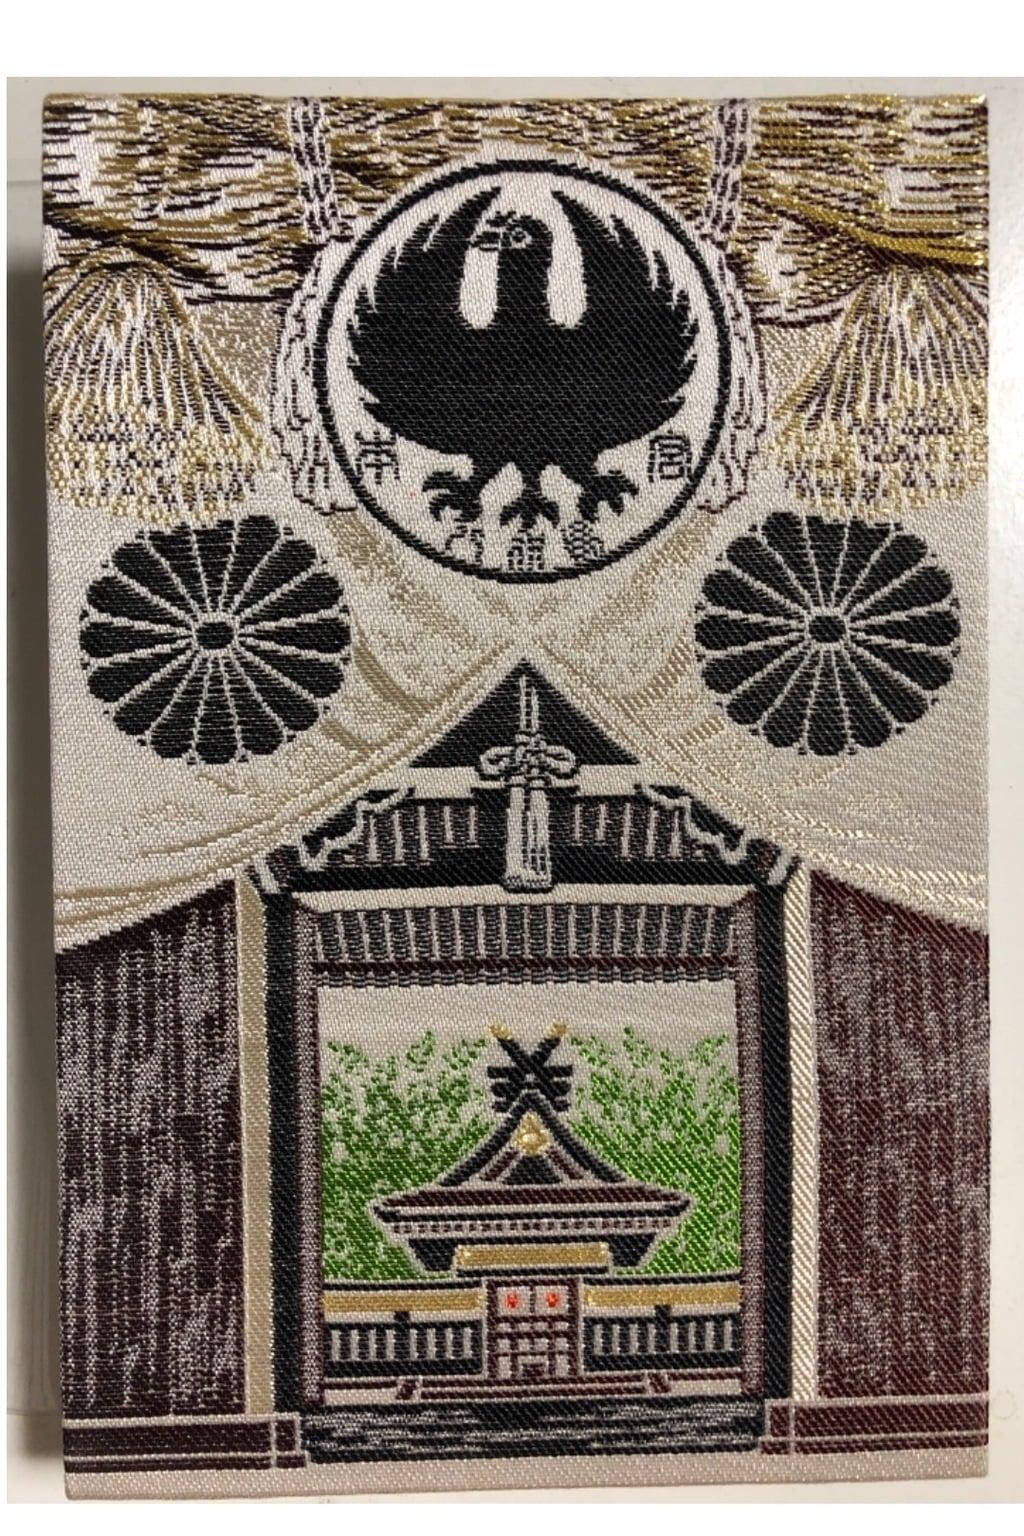 熊野本宮大社の御朱印帳